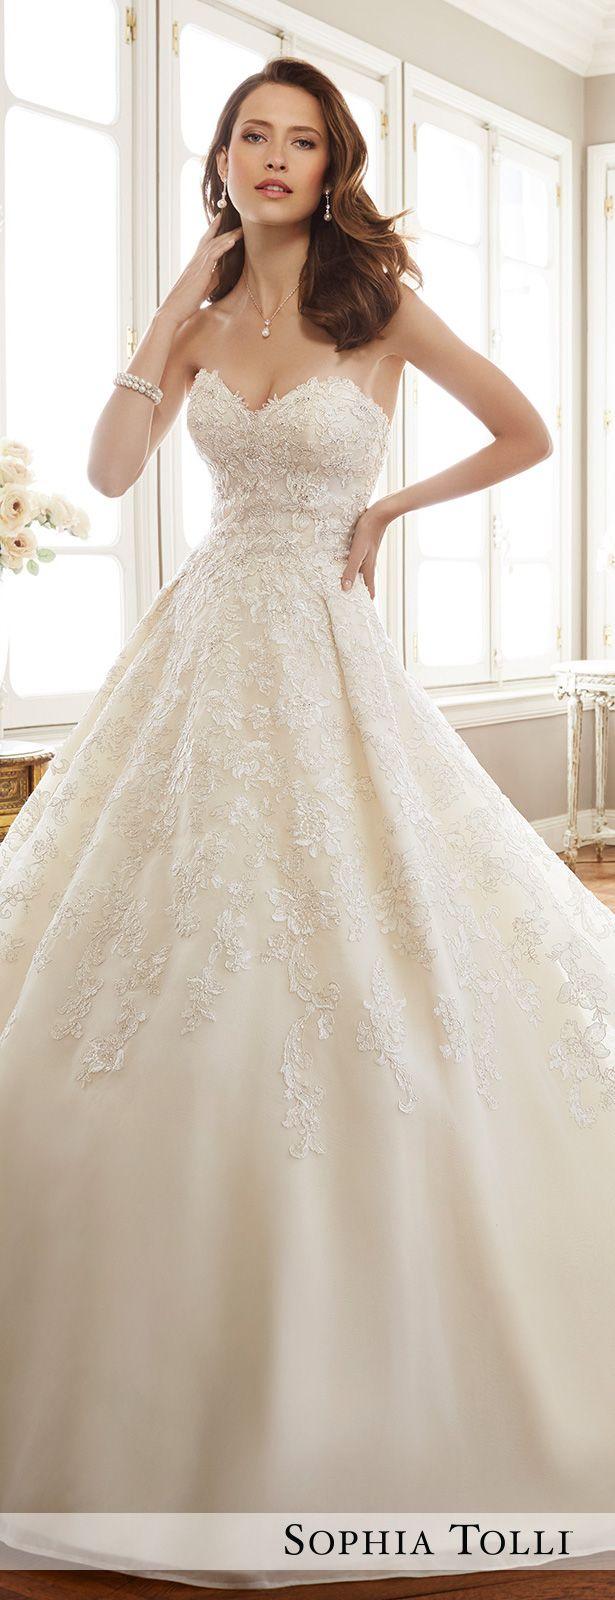 Sophia Tolli Spring 18 Wedding Dress Collection   Kleider ...